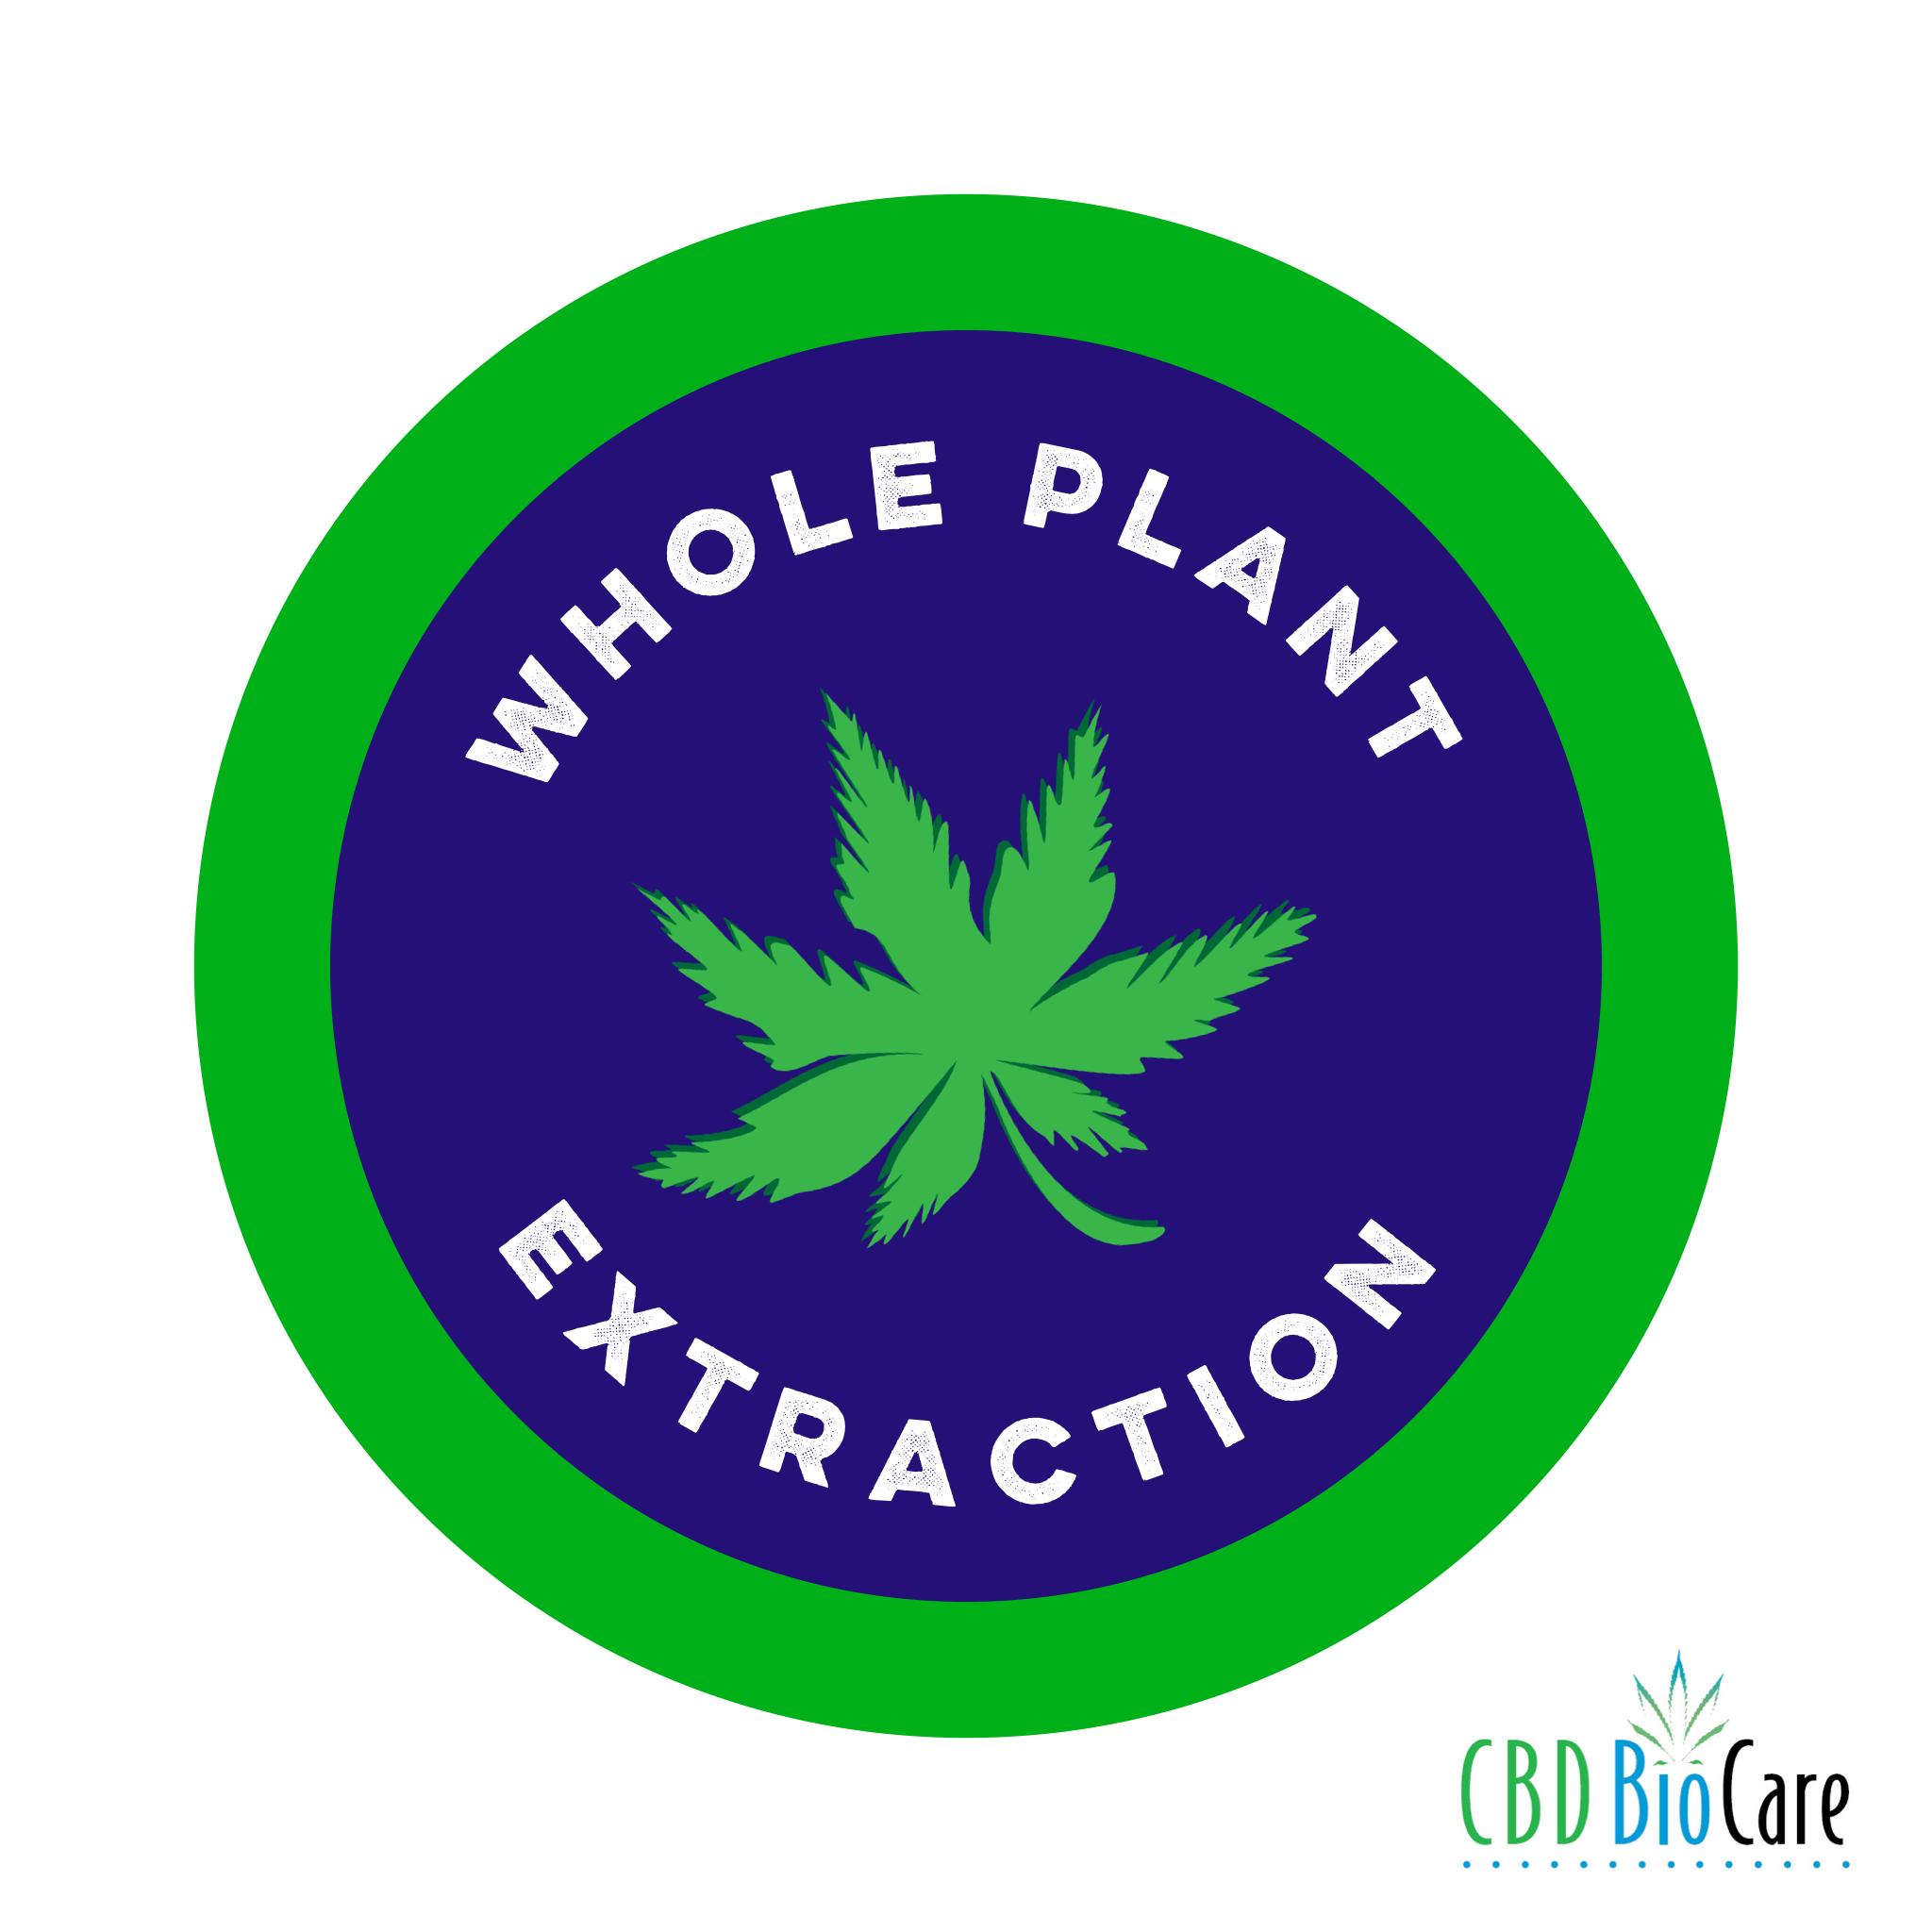 cbd biocare whole plant extraction